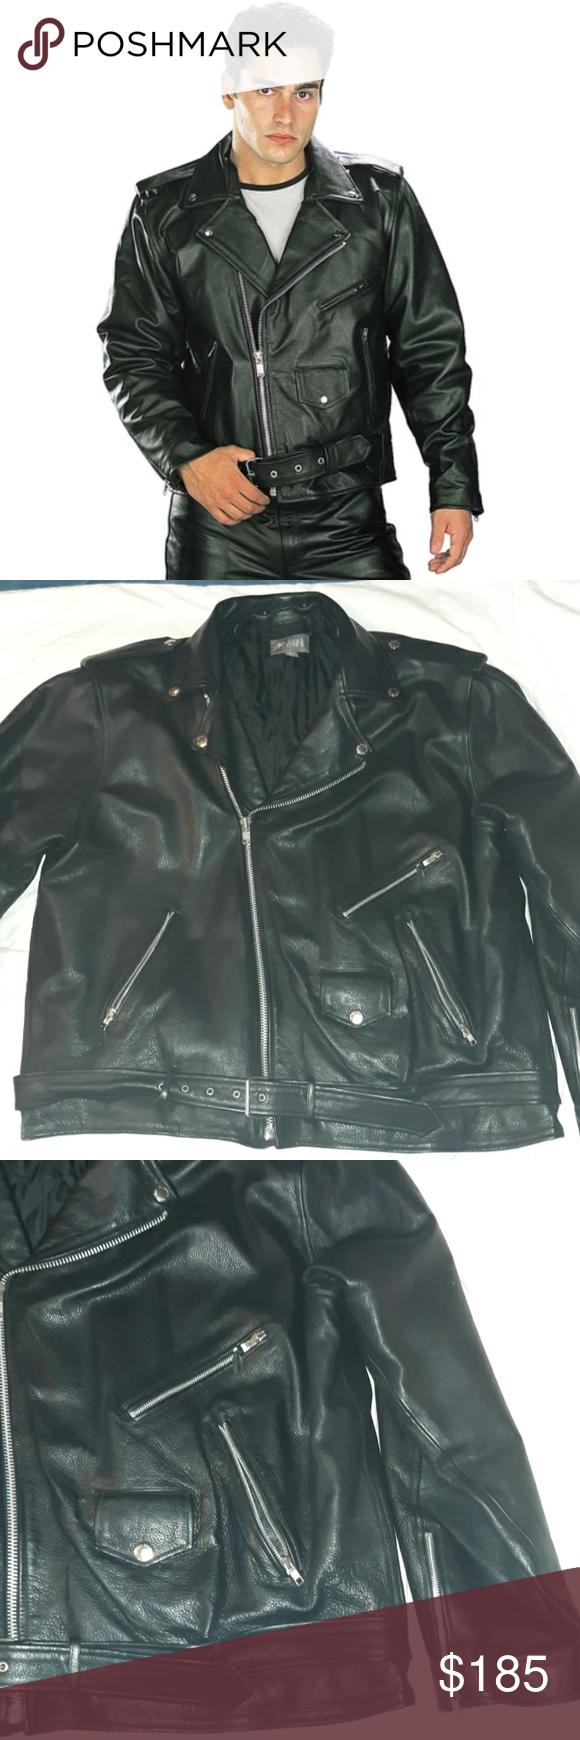 Wilson S Black Leather Biker Motorcycle Jacket 3lt Jackets Black Leather Wilsons Leather Jacket [ png ]